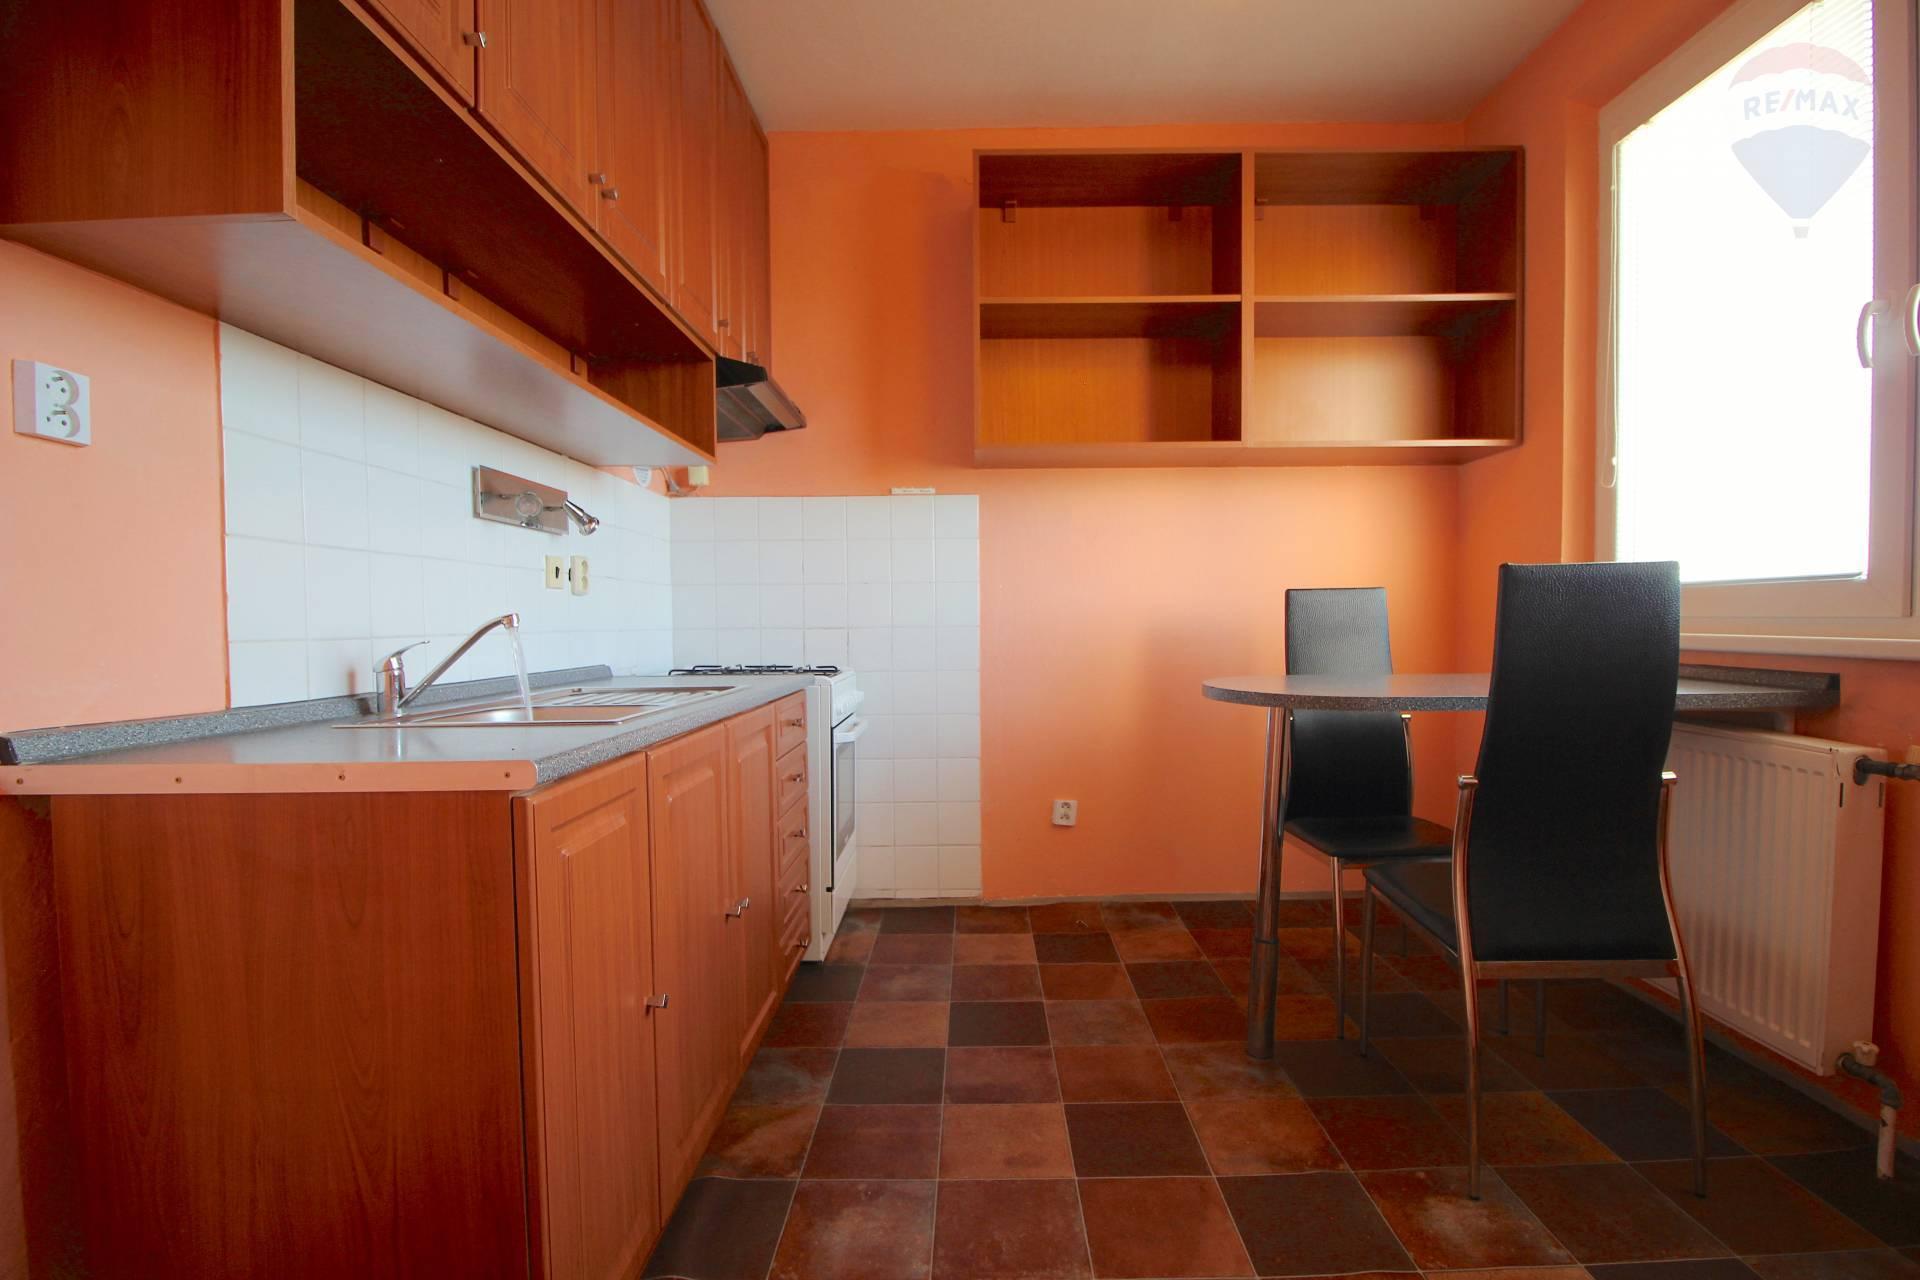 Predaj bytu (1 izbový) 44 m2, Bratislava - Ružinov -